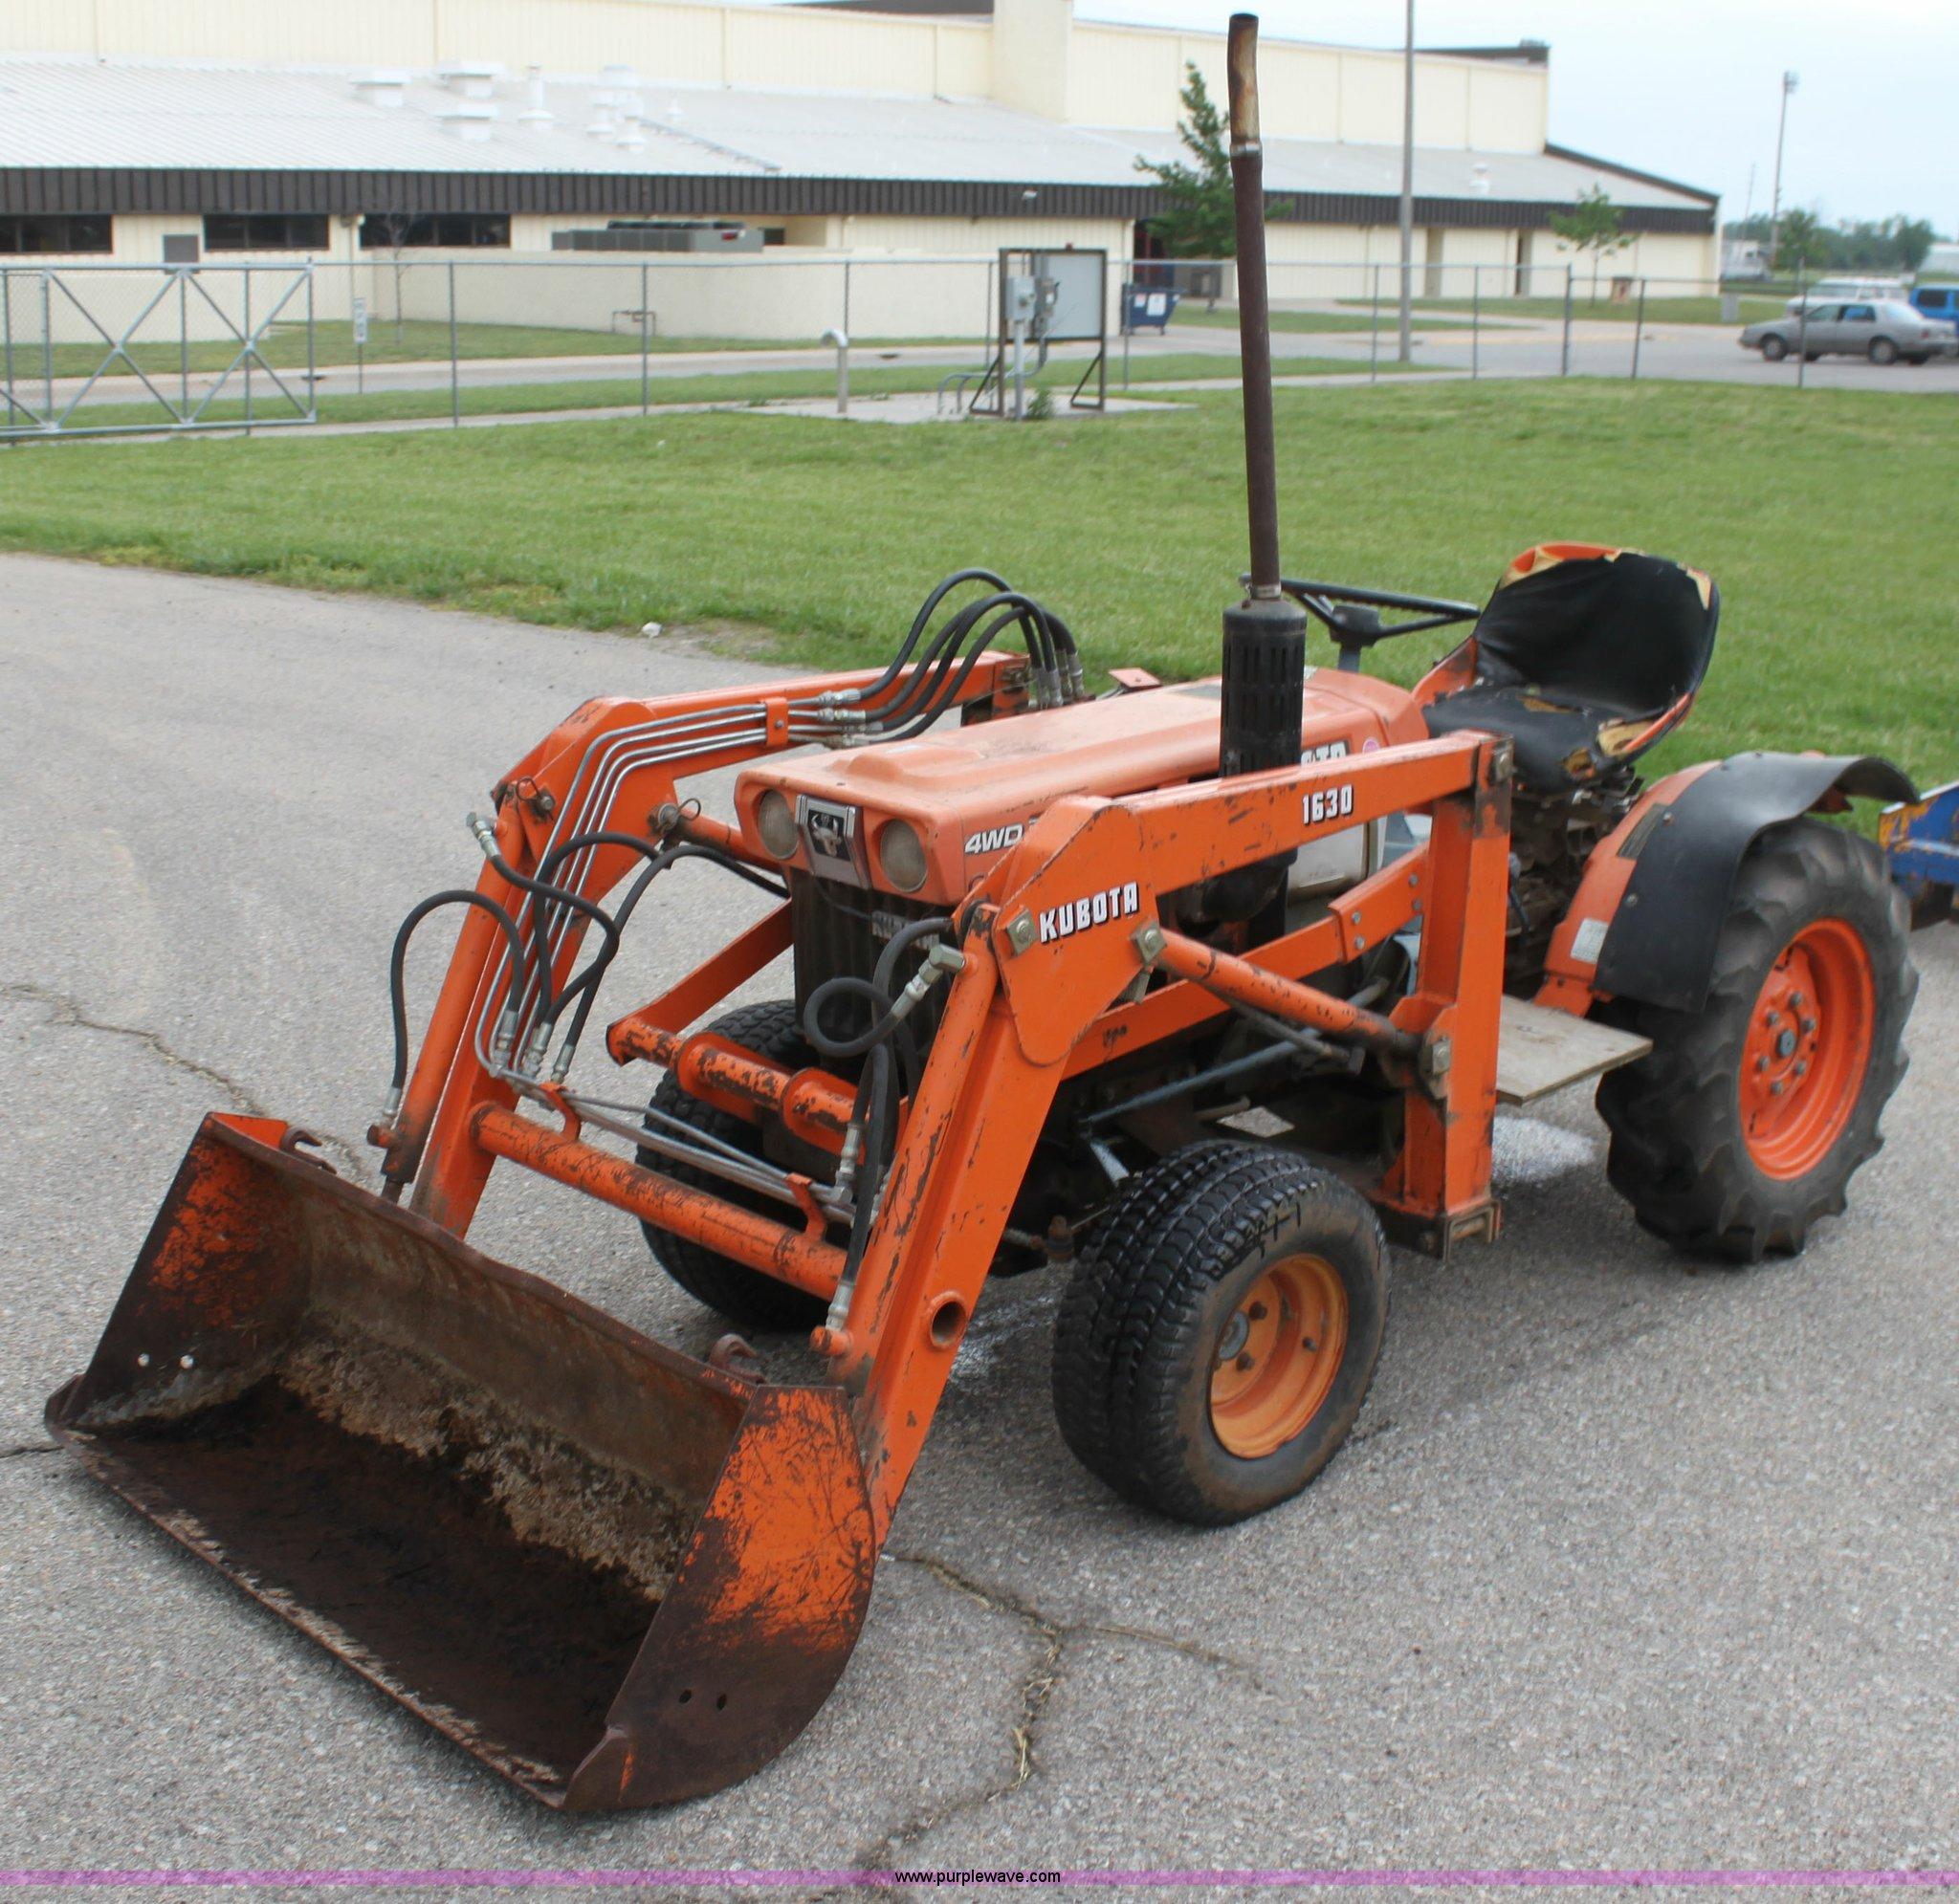 Kubota B7100 Backhoe : Kubota b wst tractor item f sold june